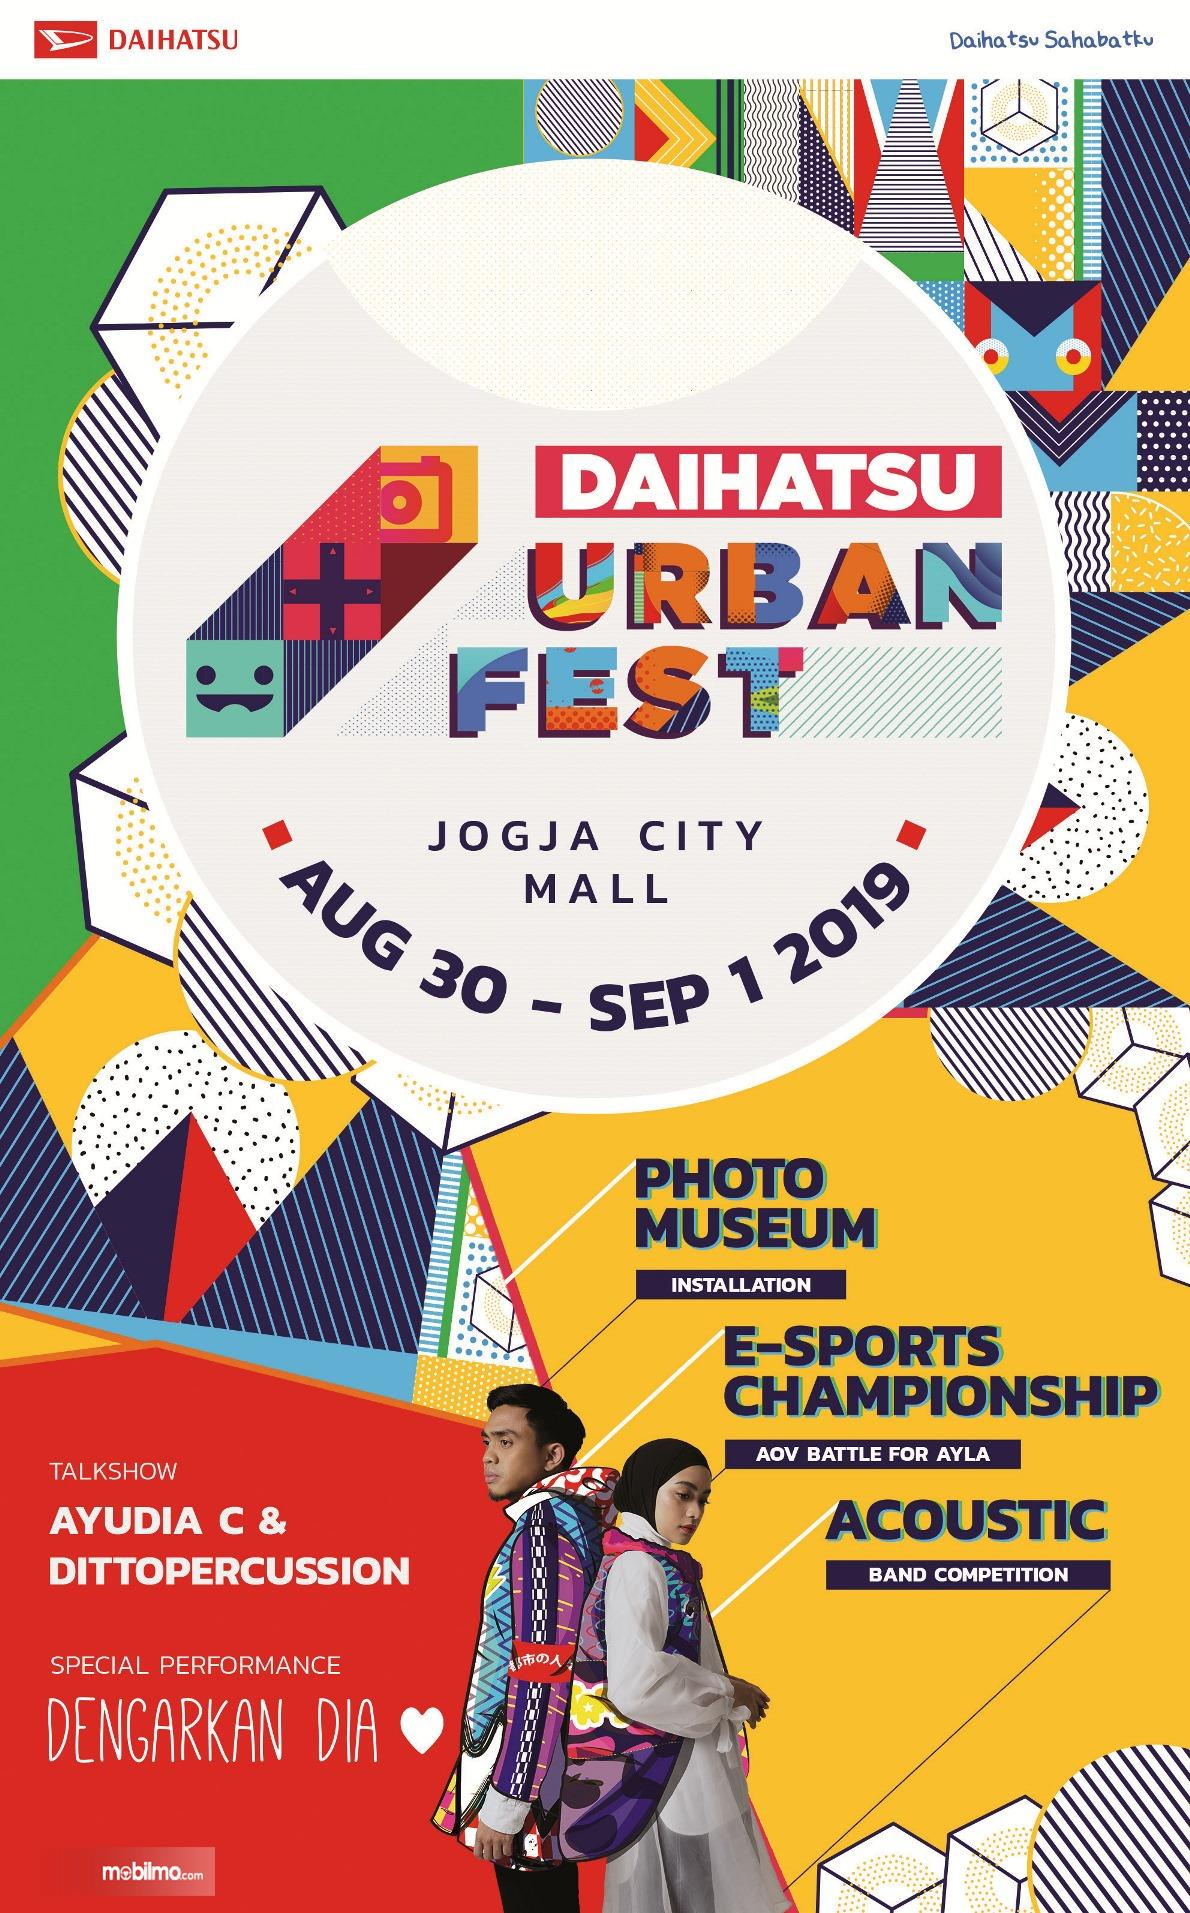 Gambar menunjukkan manner urban fest Daihatsu